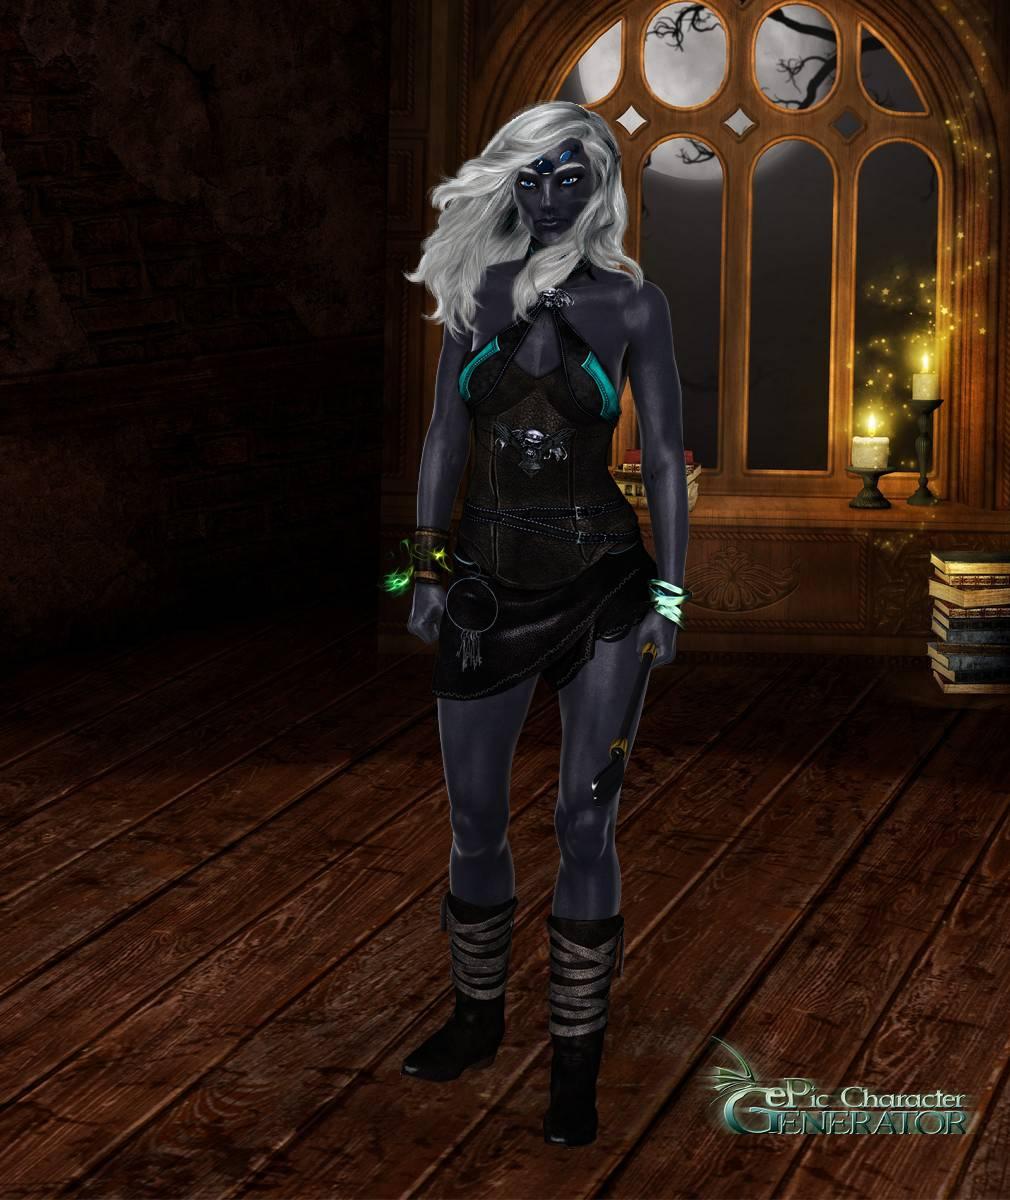 ePic Character Generator Season 2 Female Drow Spellcaster Screenshot 13